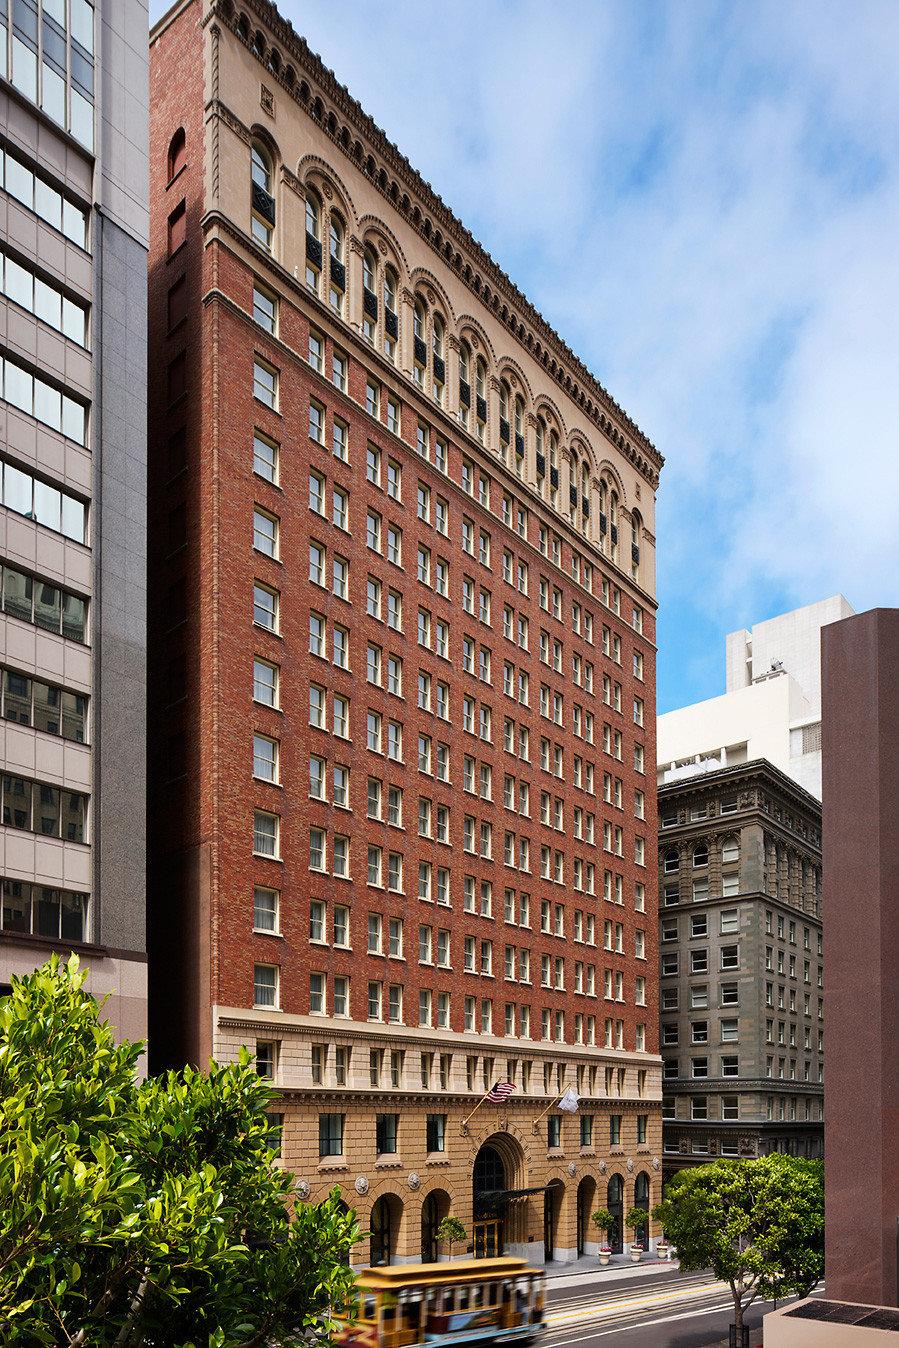 building tower block landmark City metropolitan area neighbourhood Architecture Downtown residential area condominium plaza skyscraper tall metropolis cityscape brick apartment building